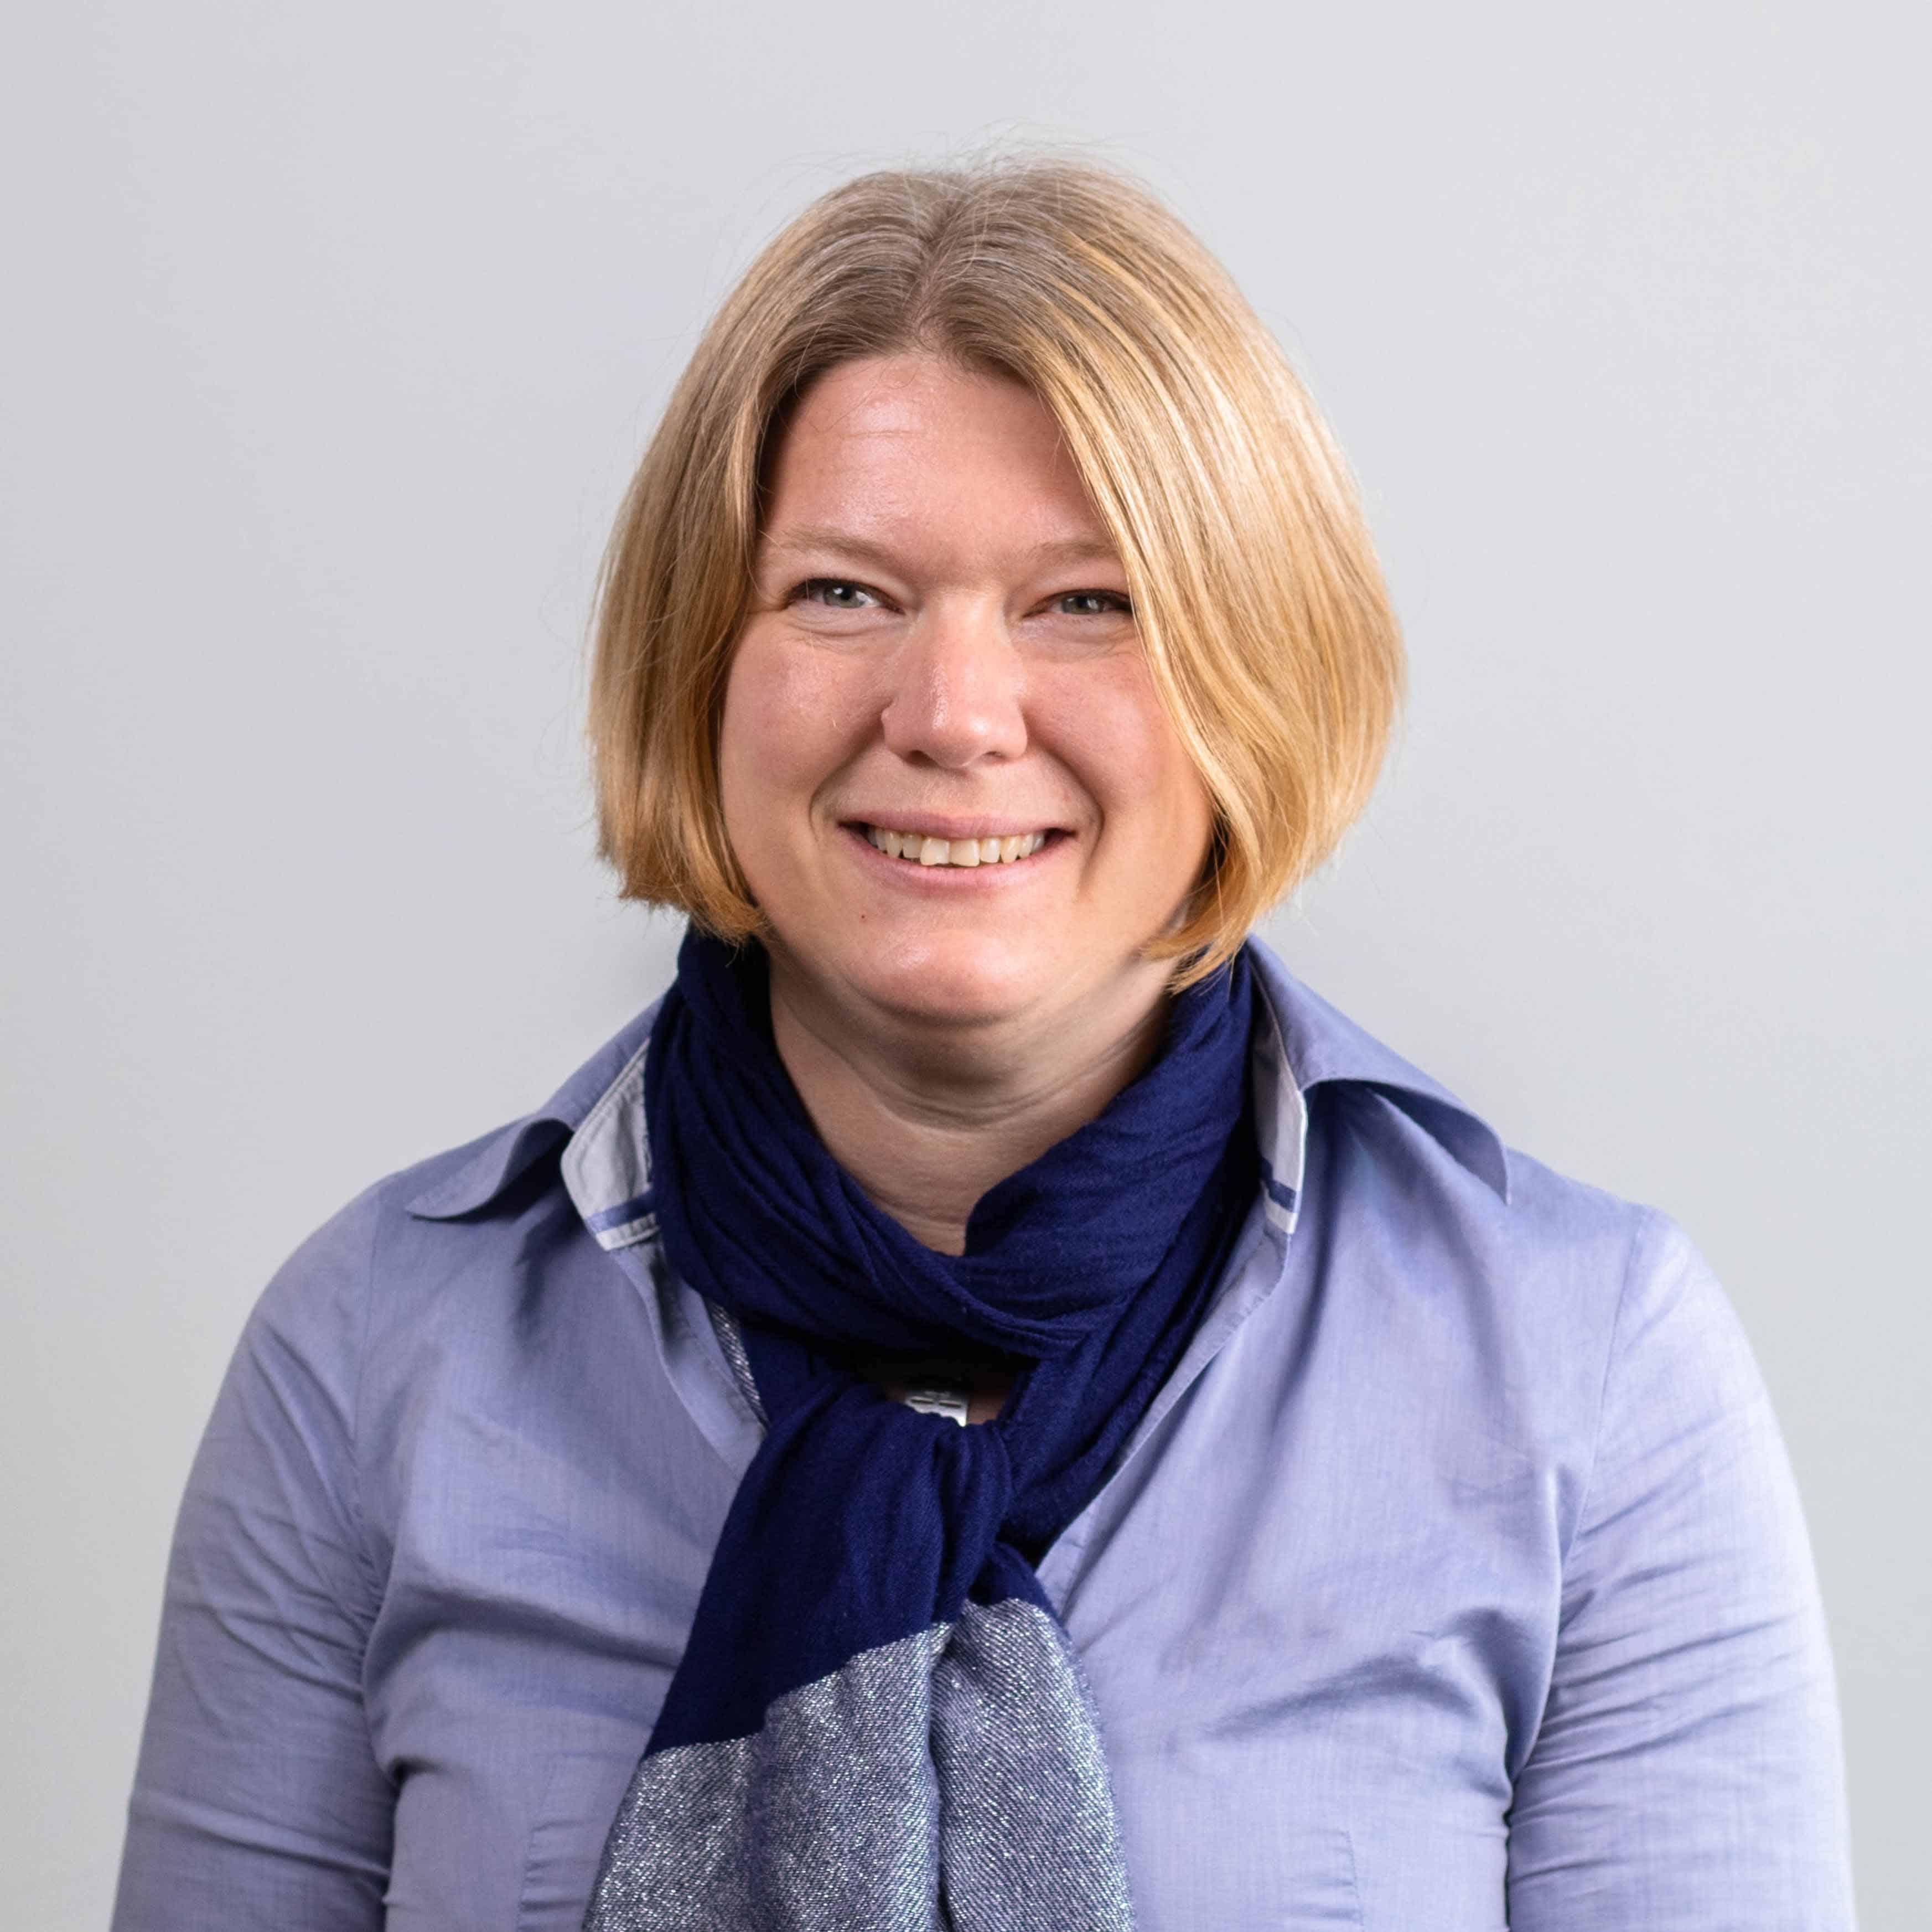 Helena Westling